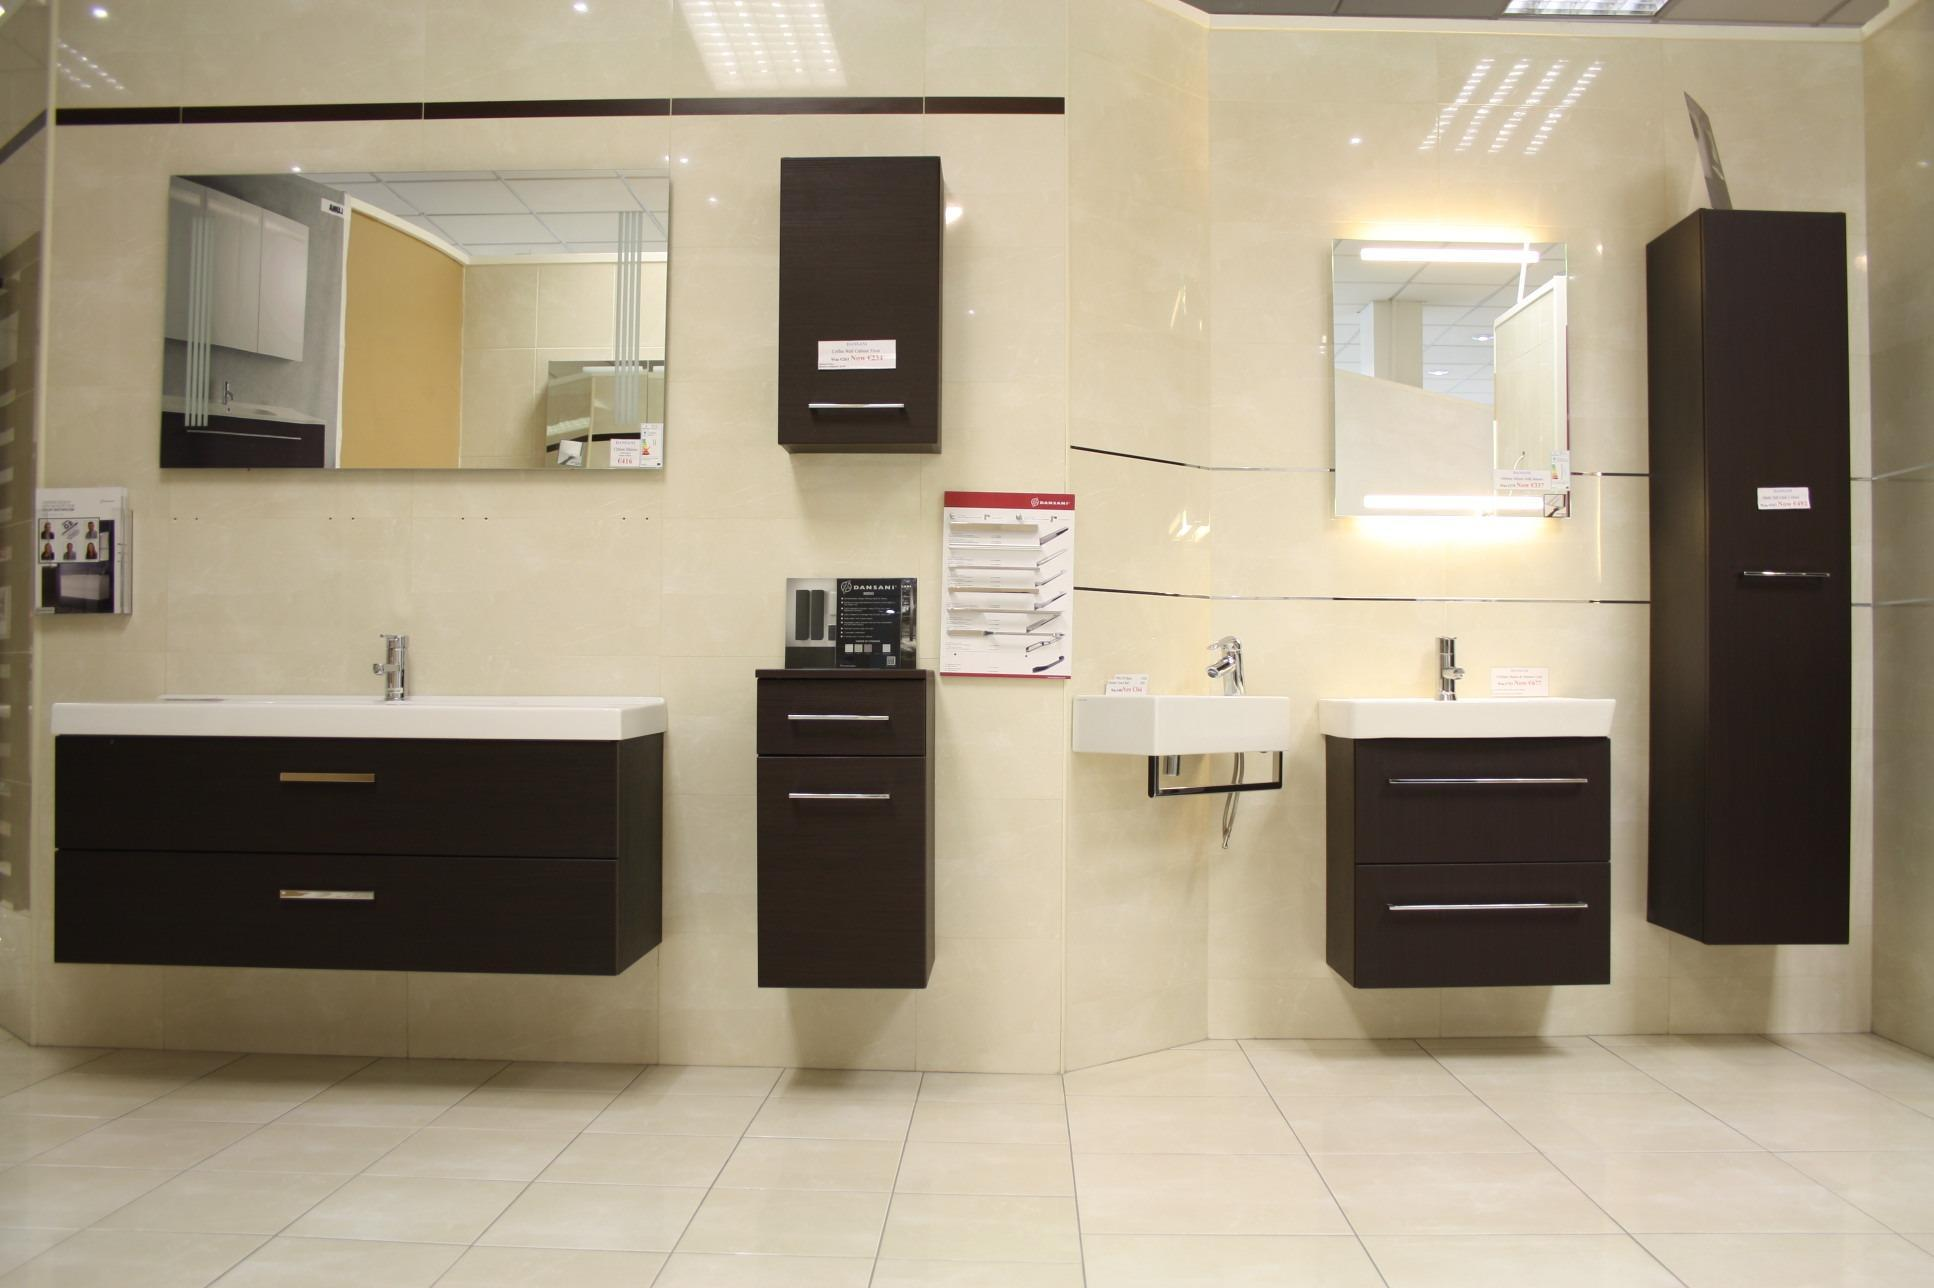 OB Heating, Plumbing, Bathrooms & Tiles